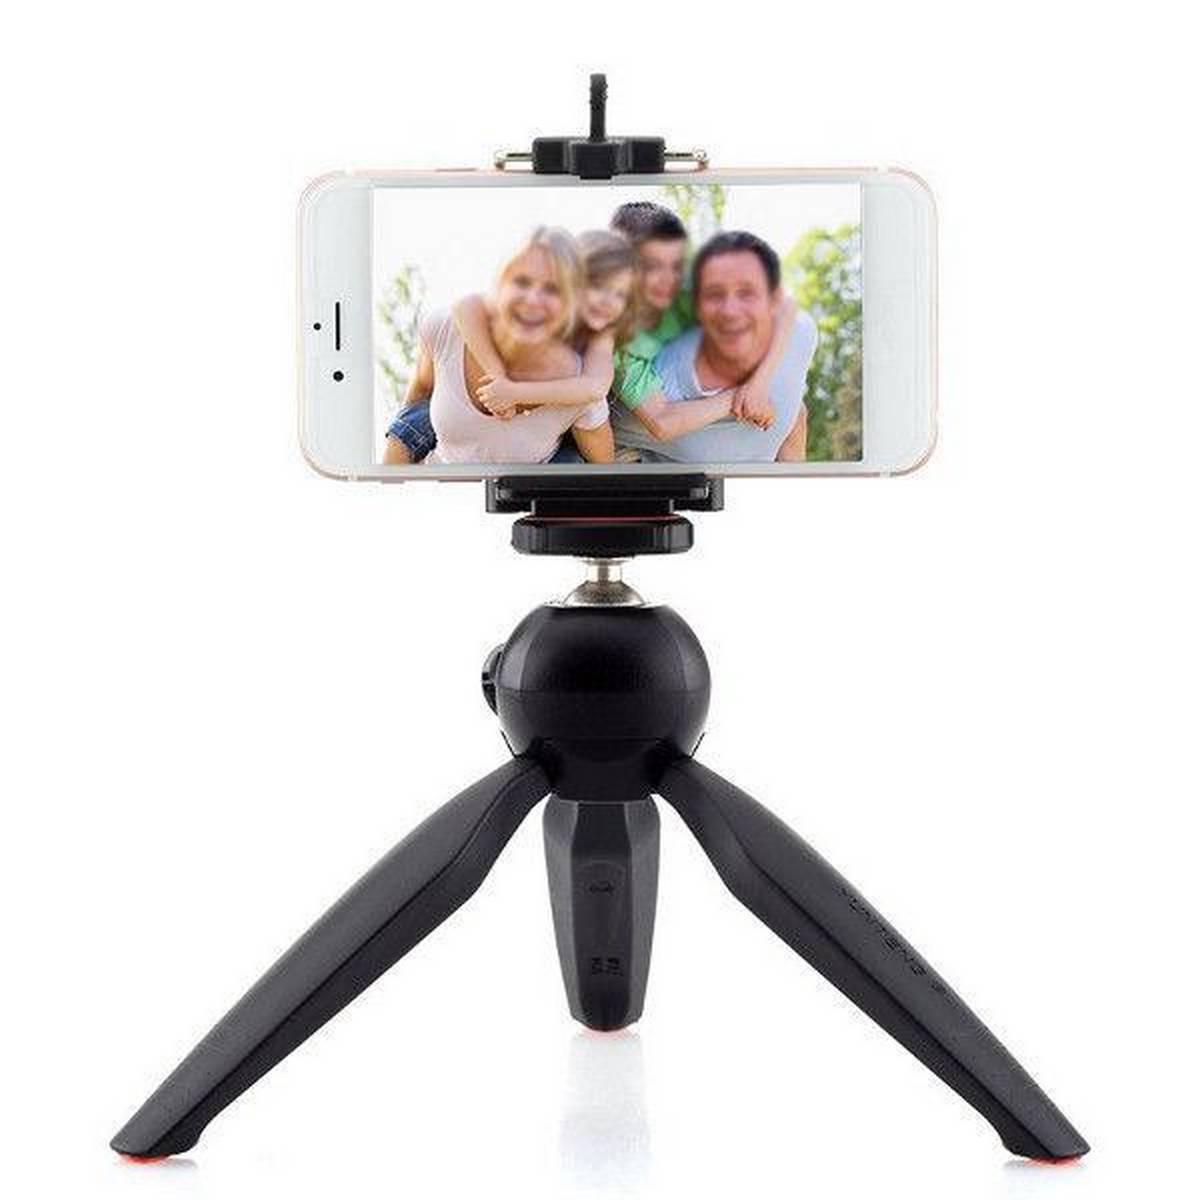 Mini Tripod Universal YT-228 for Digital Camera & All Mobile Phones